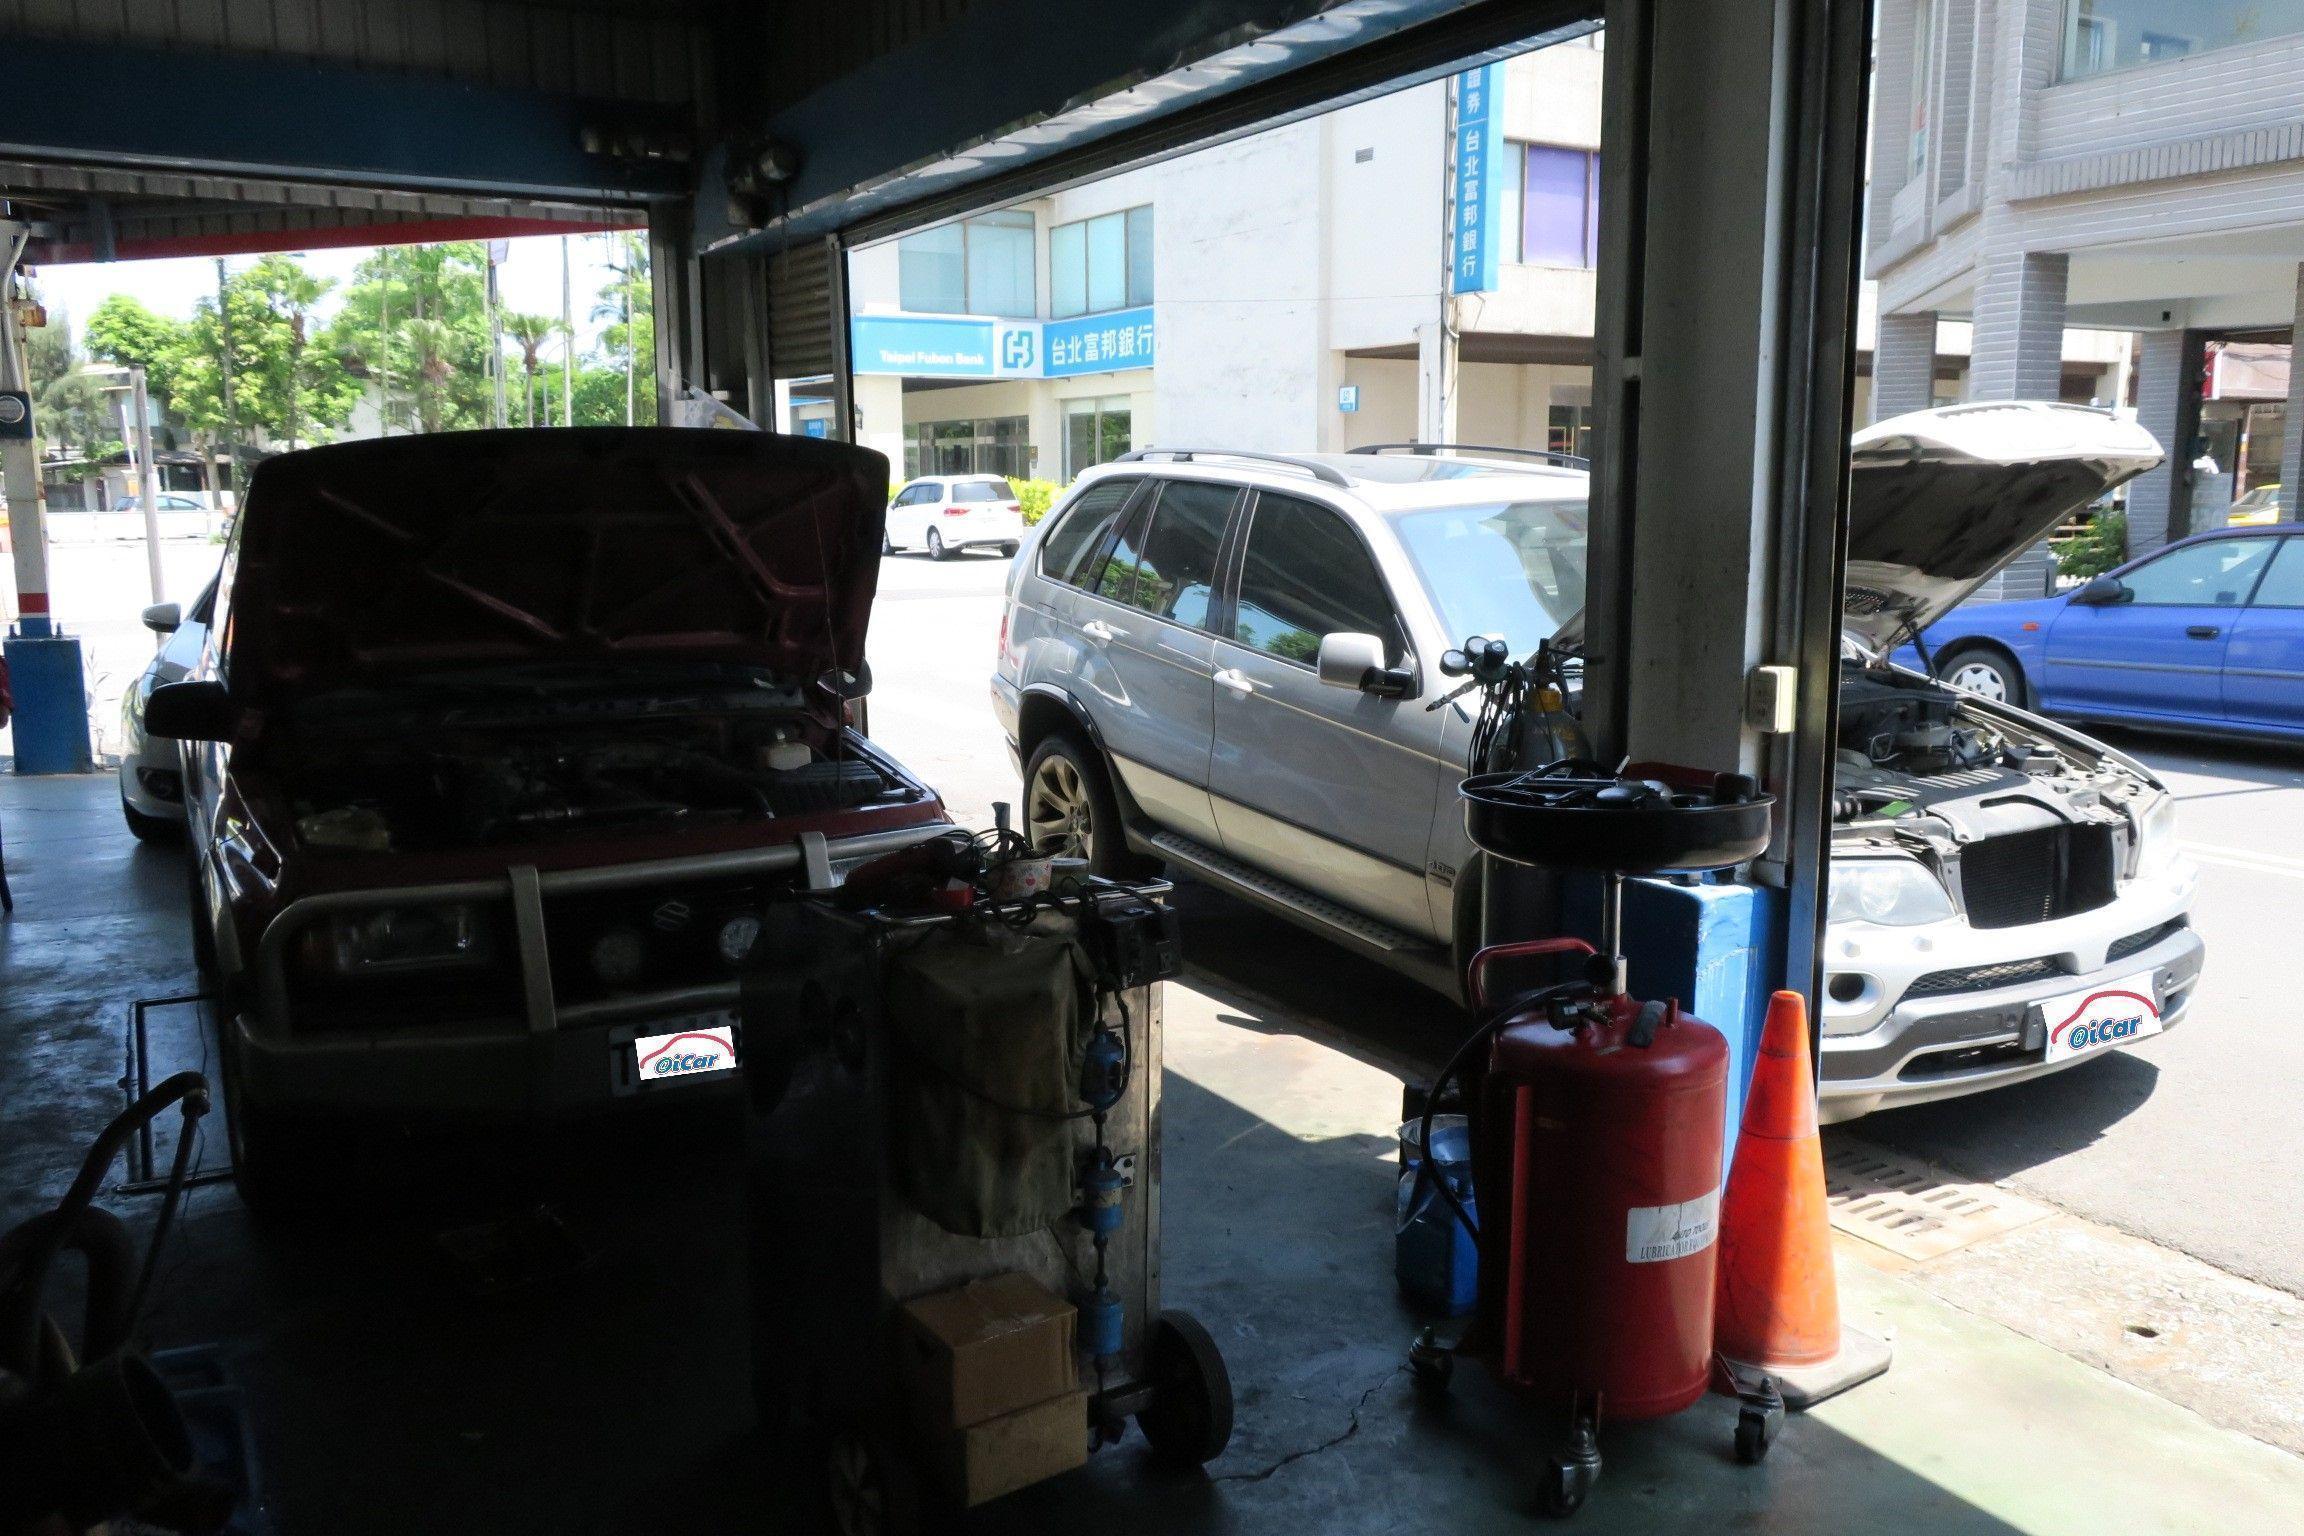 OiCar堡騰汽修廠外左側也可停放約三台保修車輛